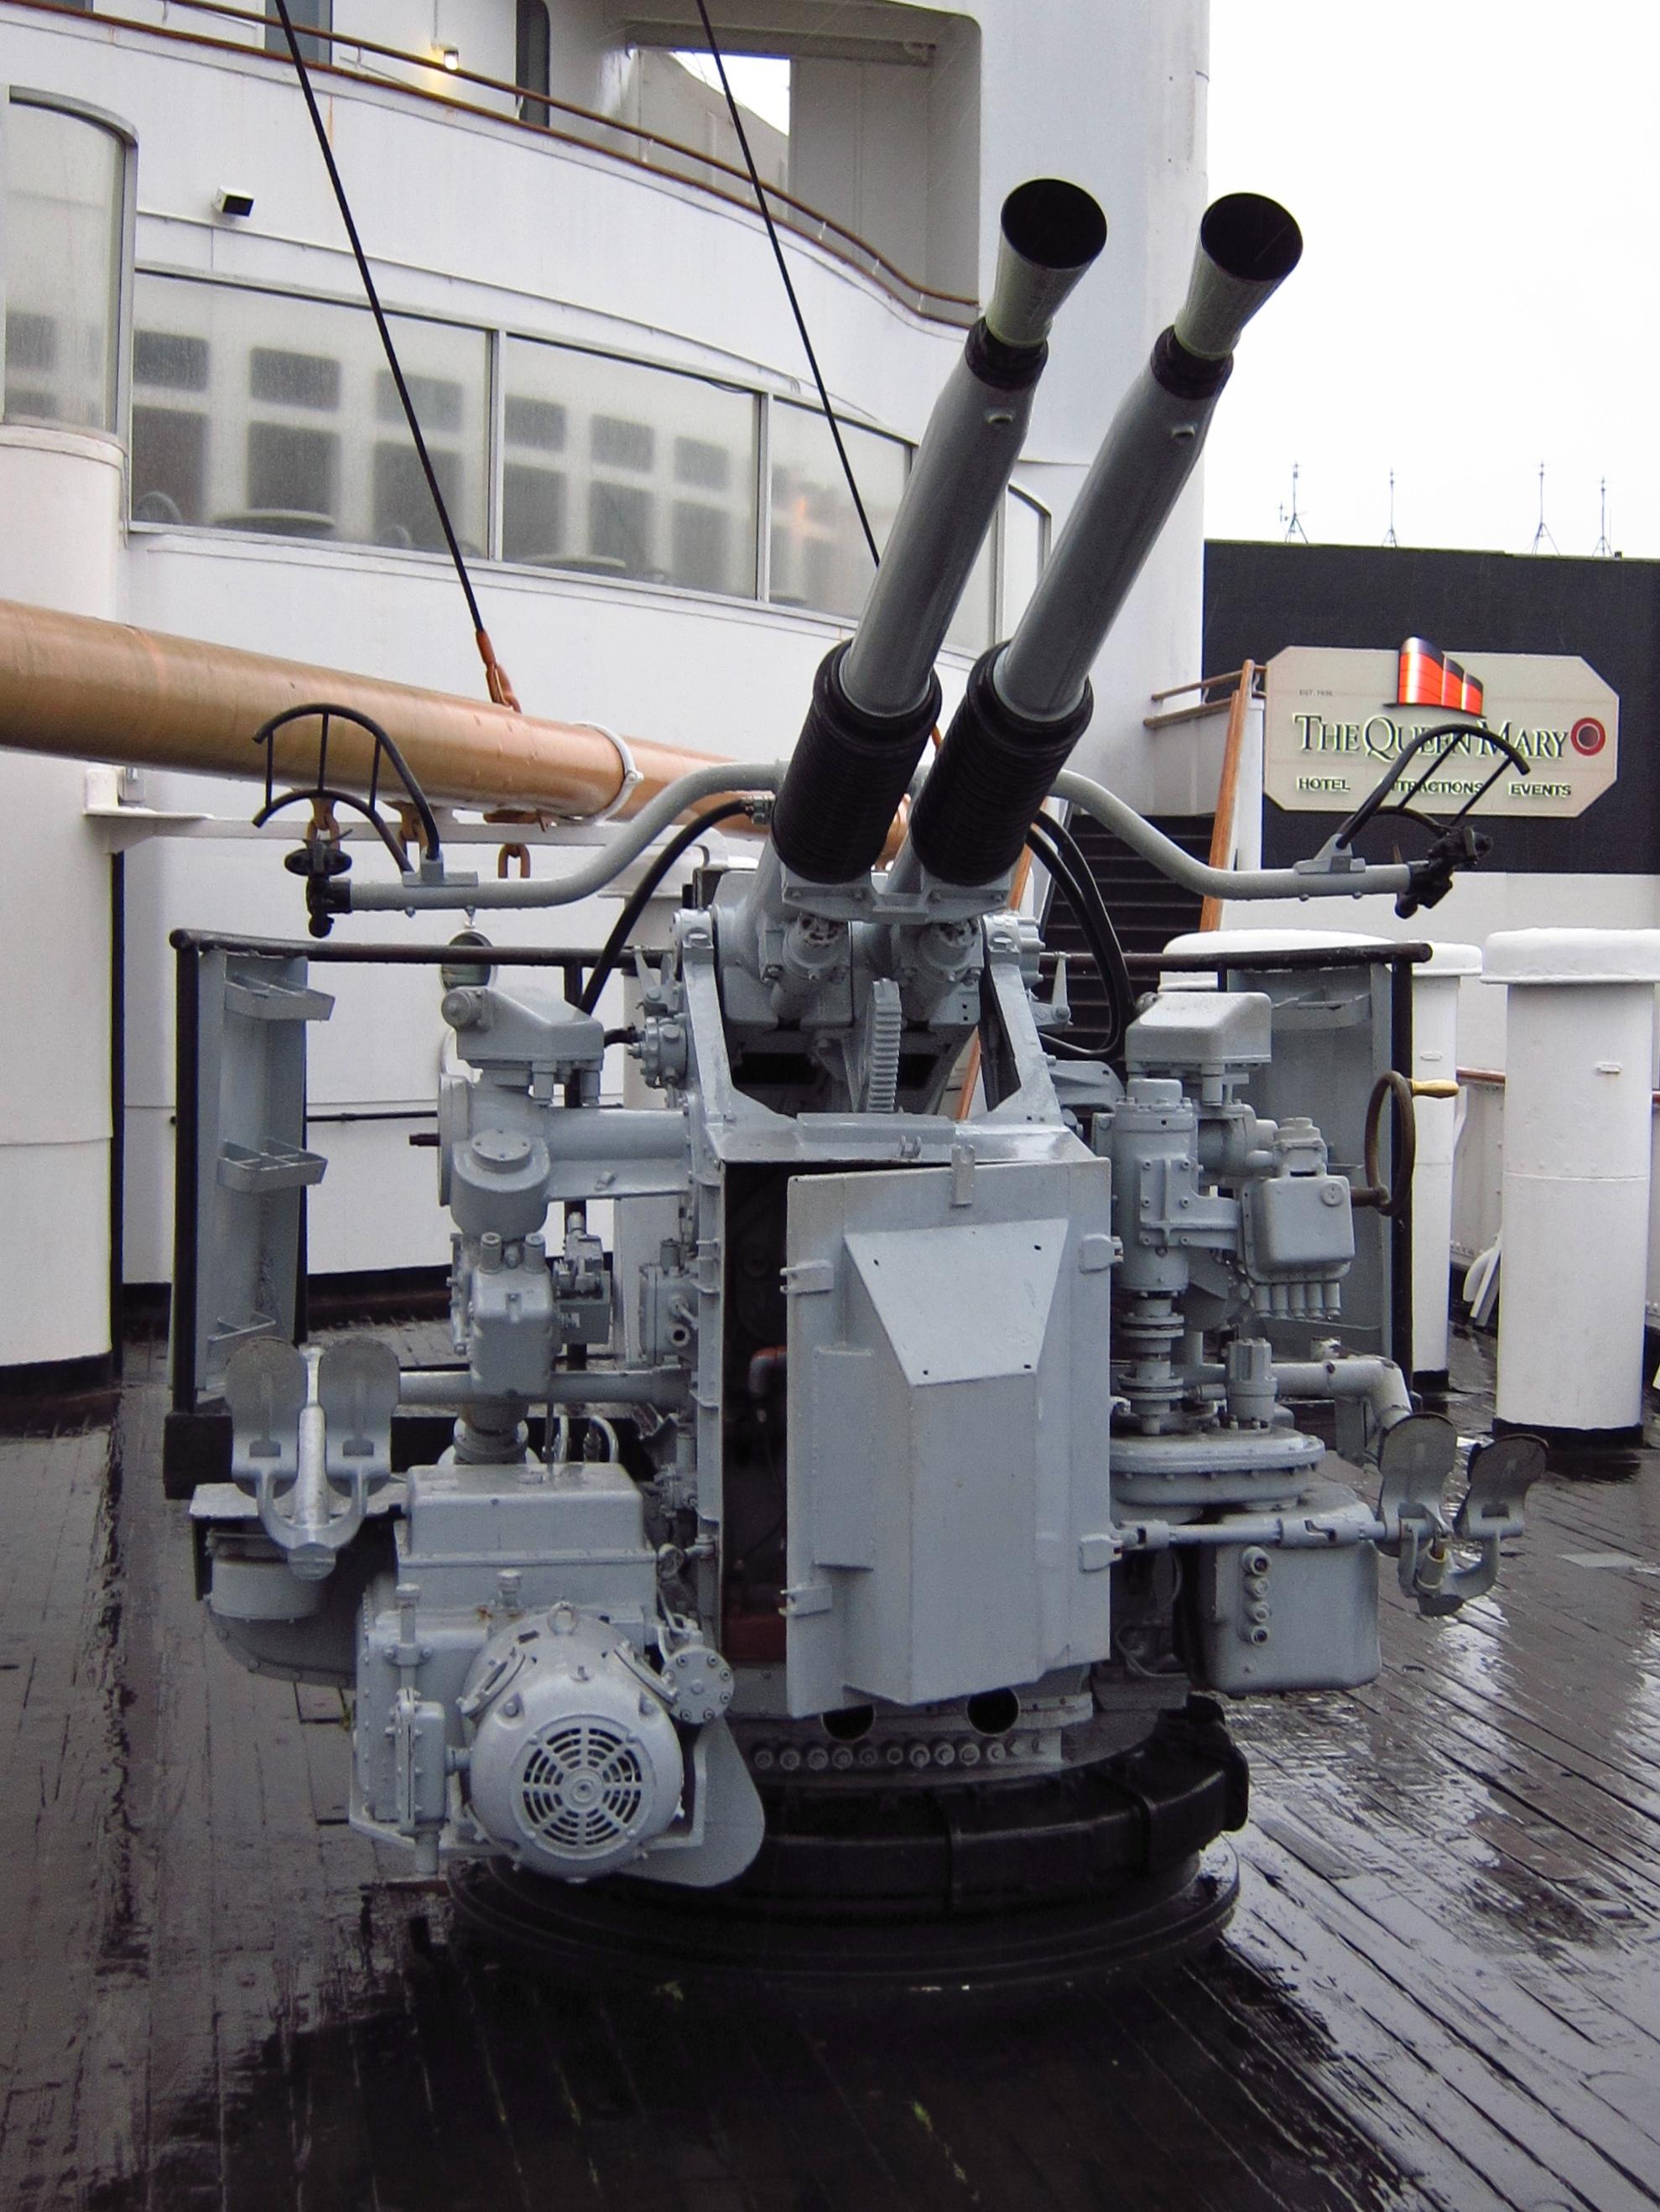 Queen Mary Engine Room: REJS: Photos: California, March 2011: Los Angeles: RMS